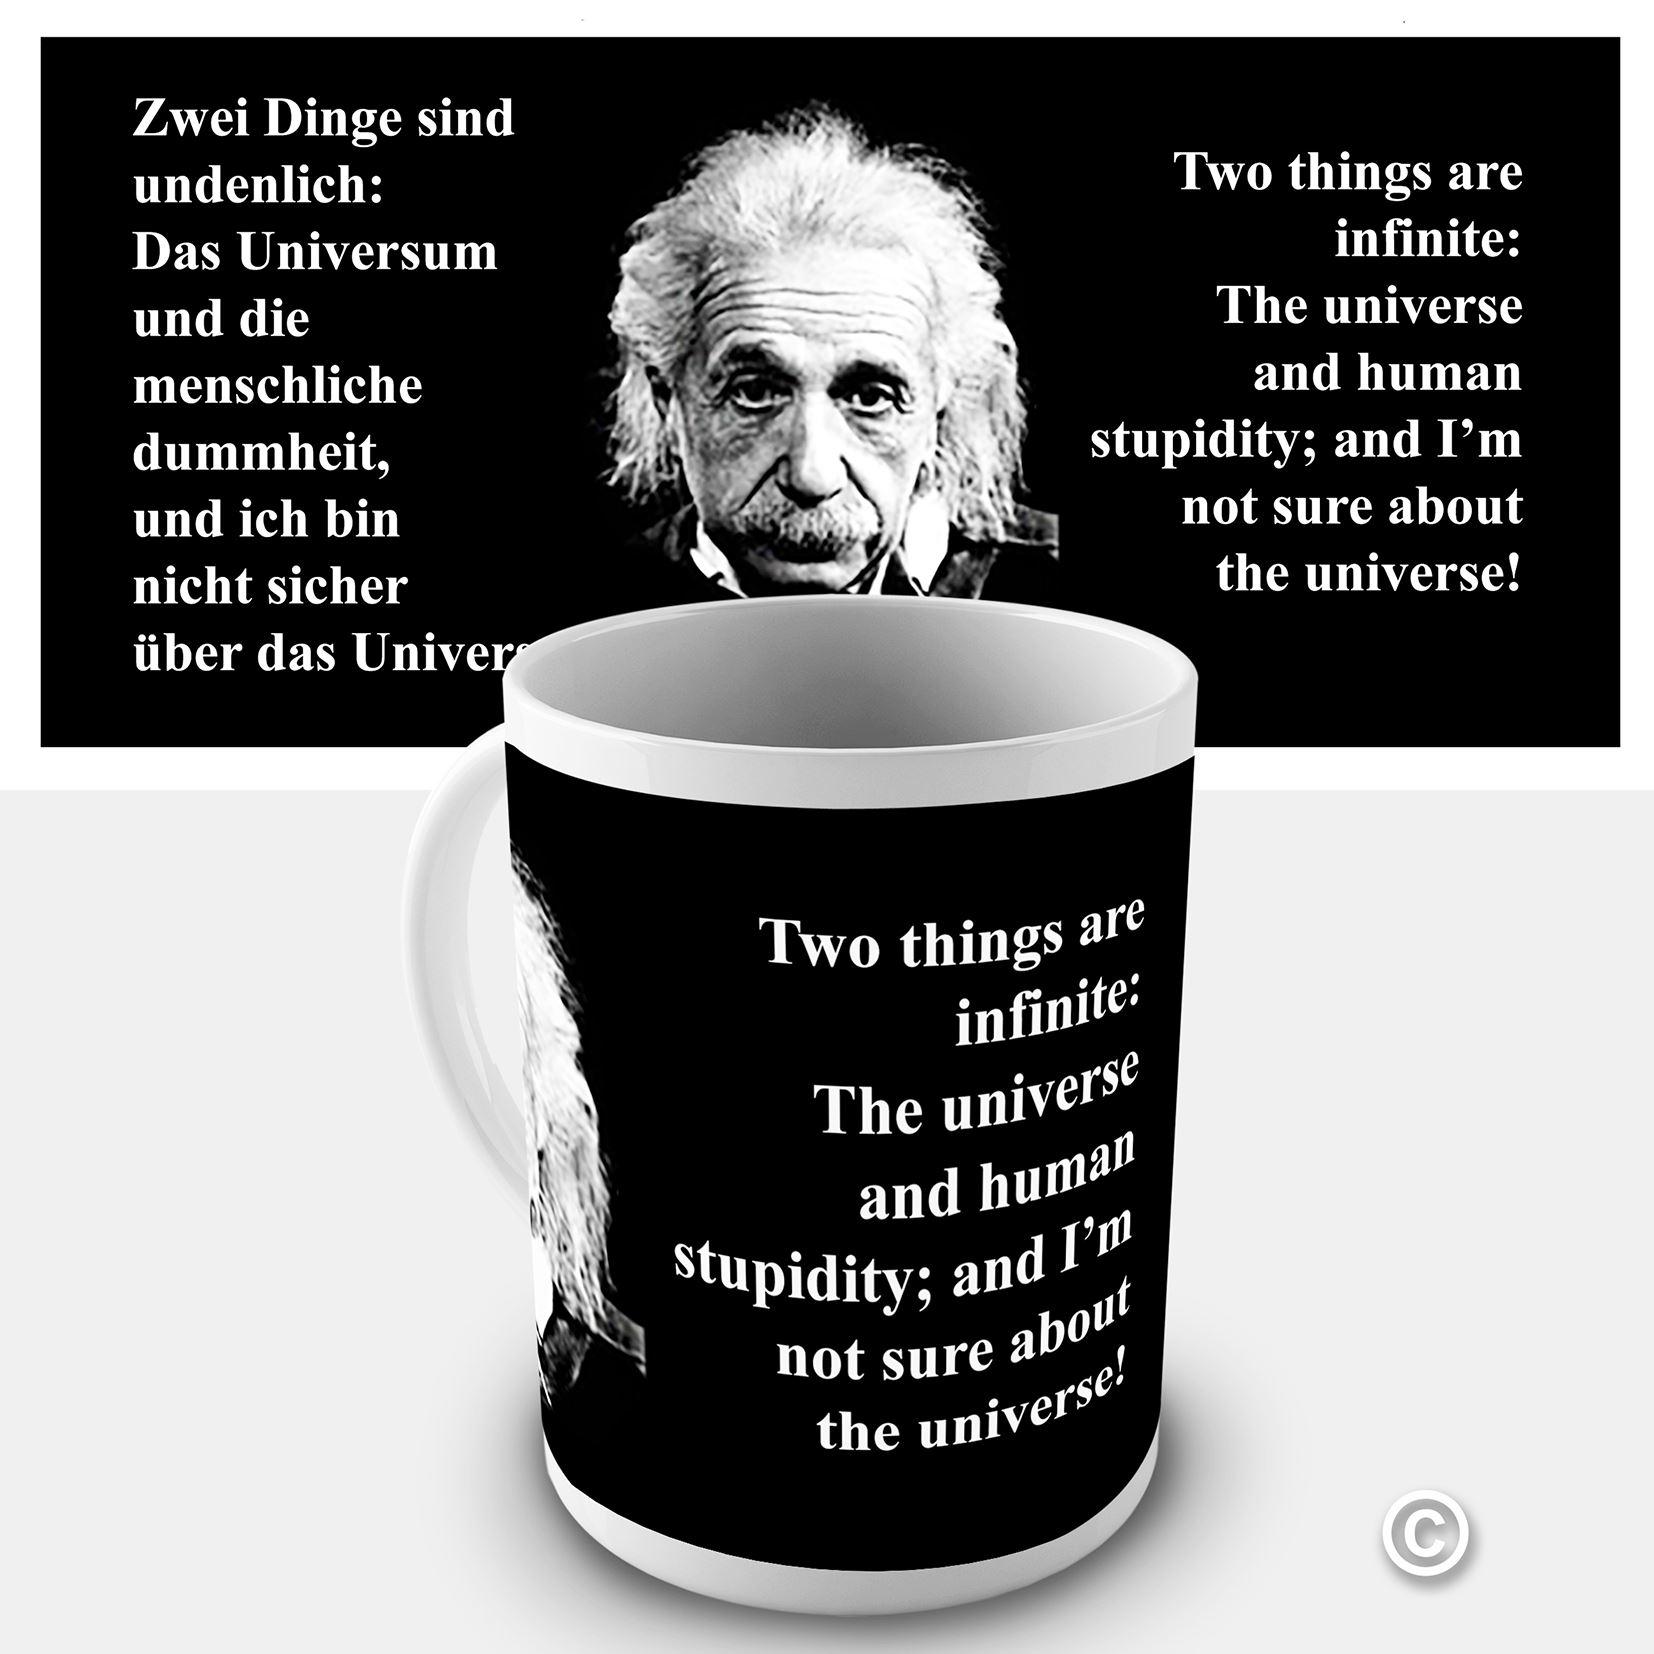 Einstein Quotes: Einstein Quote Coffee Mug The Universe And Human Stupidity